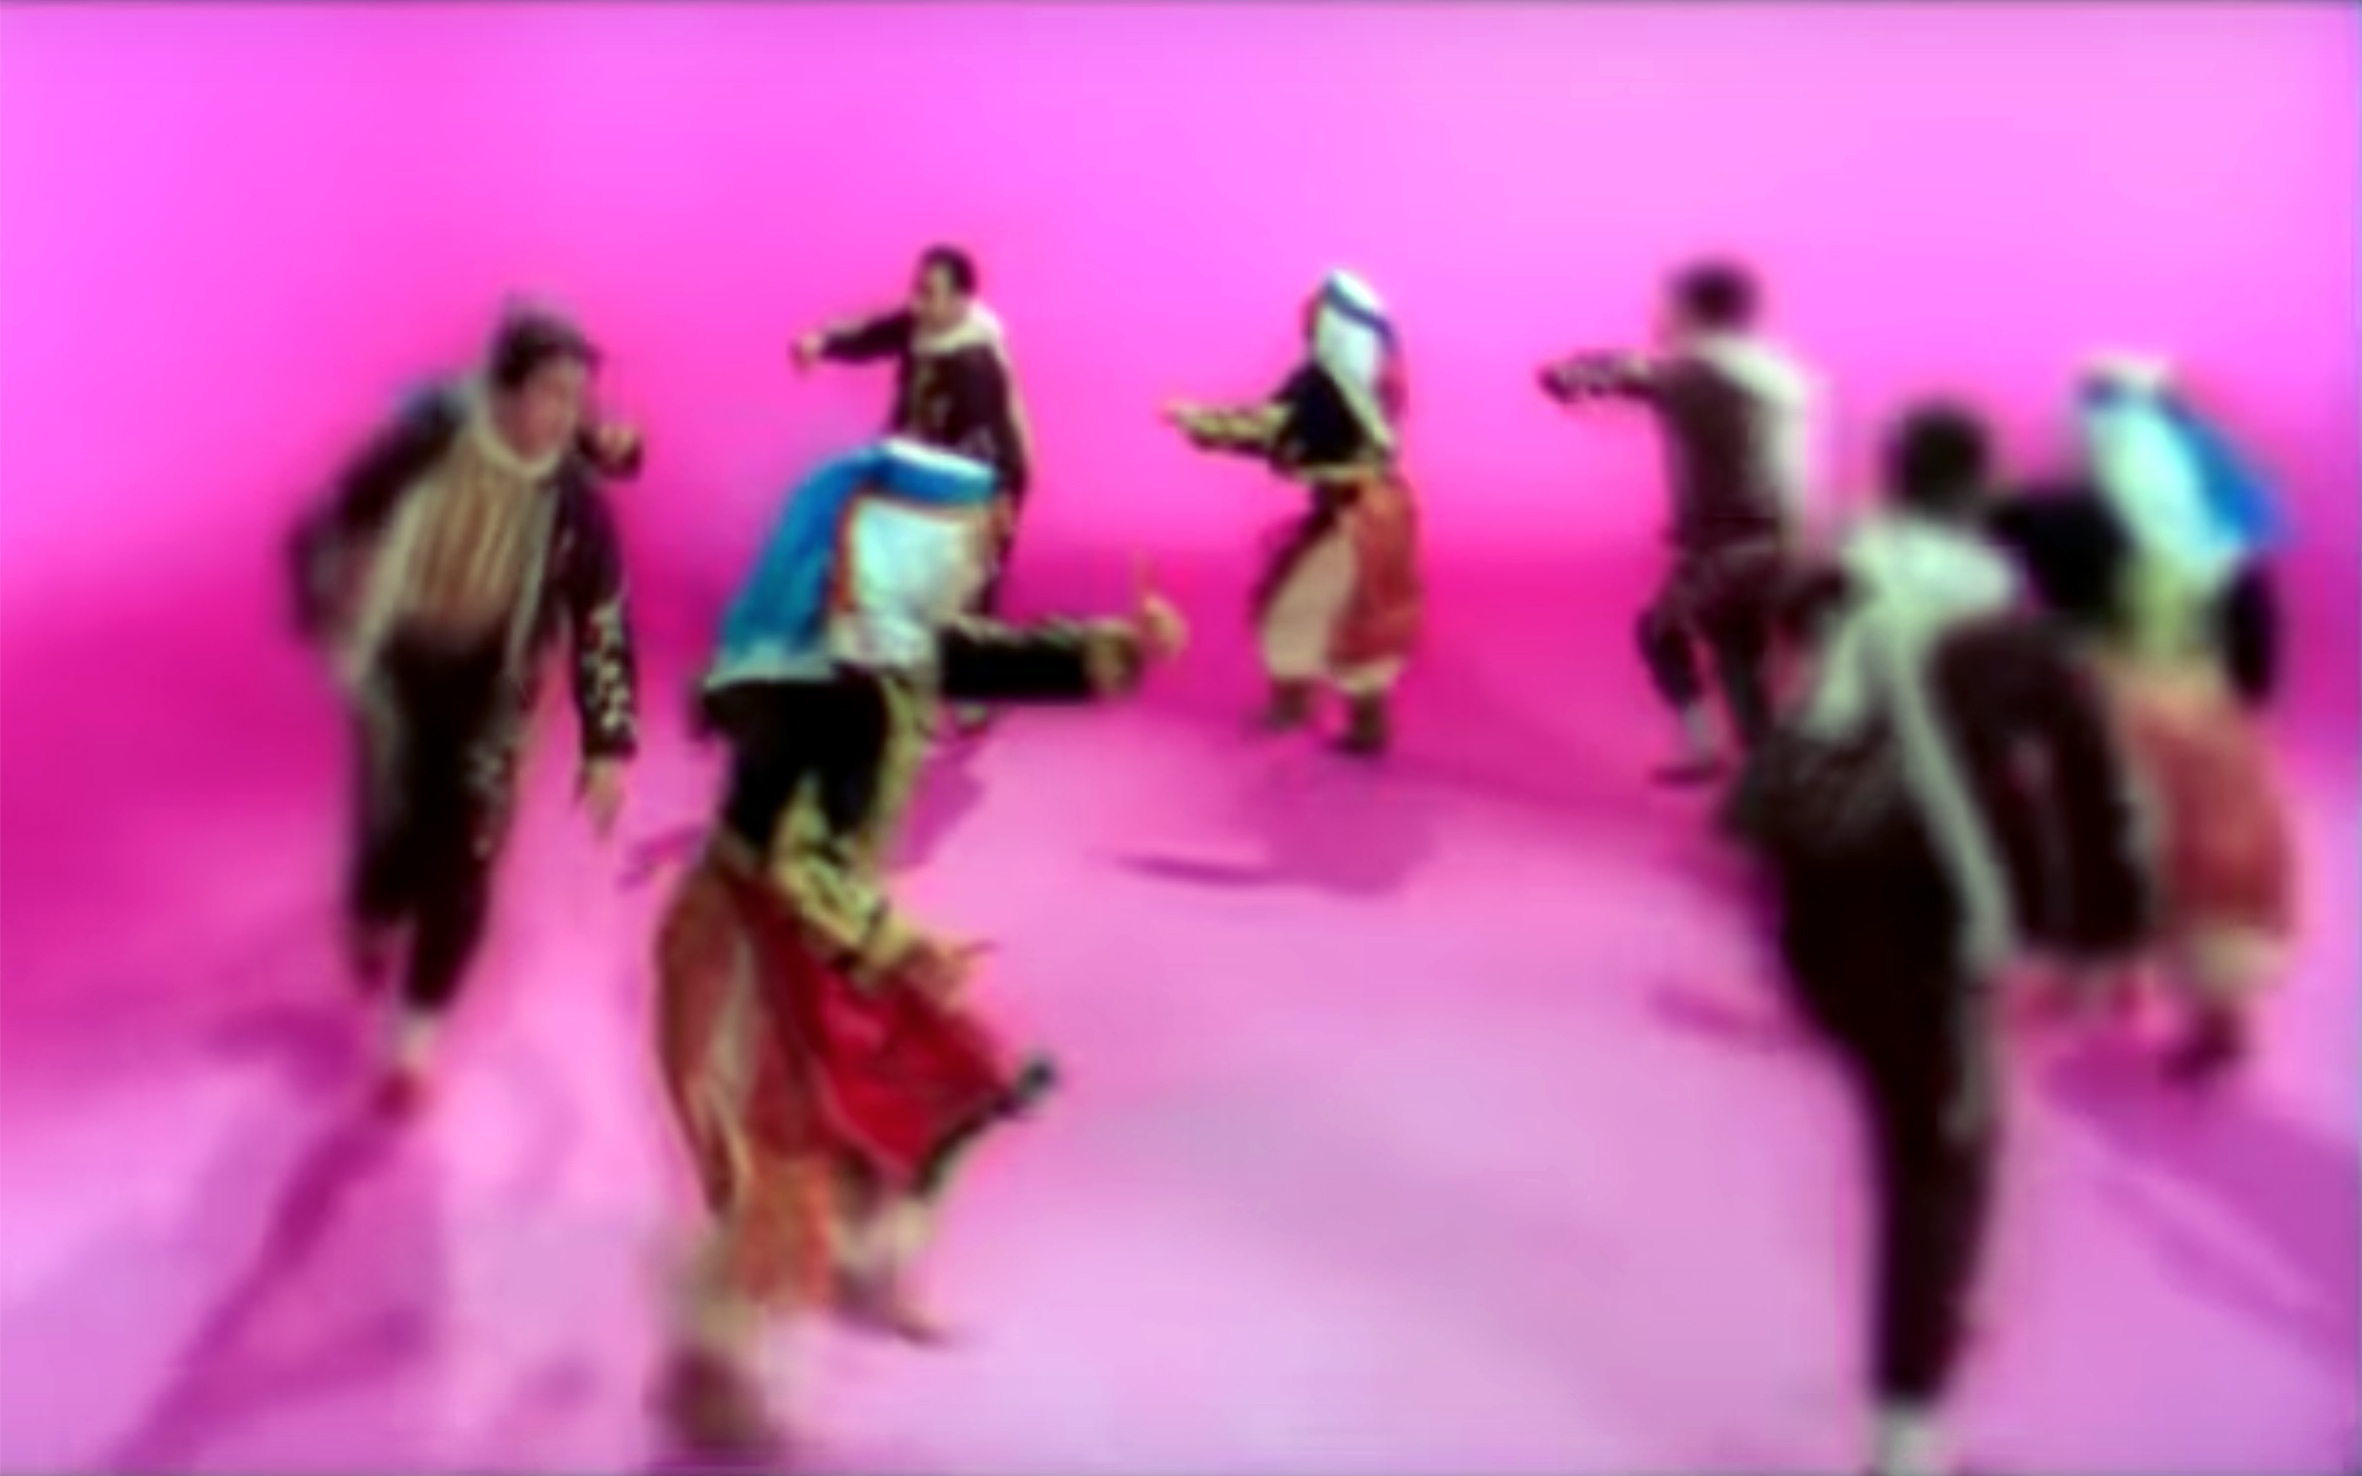 366.Hamçökelek / Turkey - Hamçökelek is a Turkish folk dance. The meter is 4/4. It is danced by Anatolian Hemshin people, Crypto-Armenians, Yörük and others. Its light-hearted lyrics tell the story of a village man's plot to seduce his love.